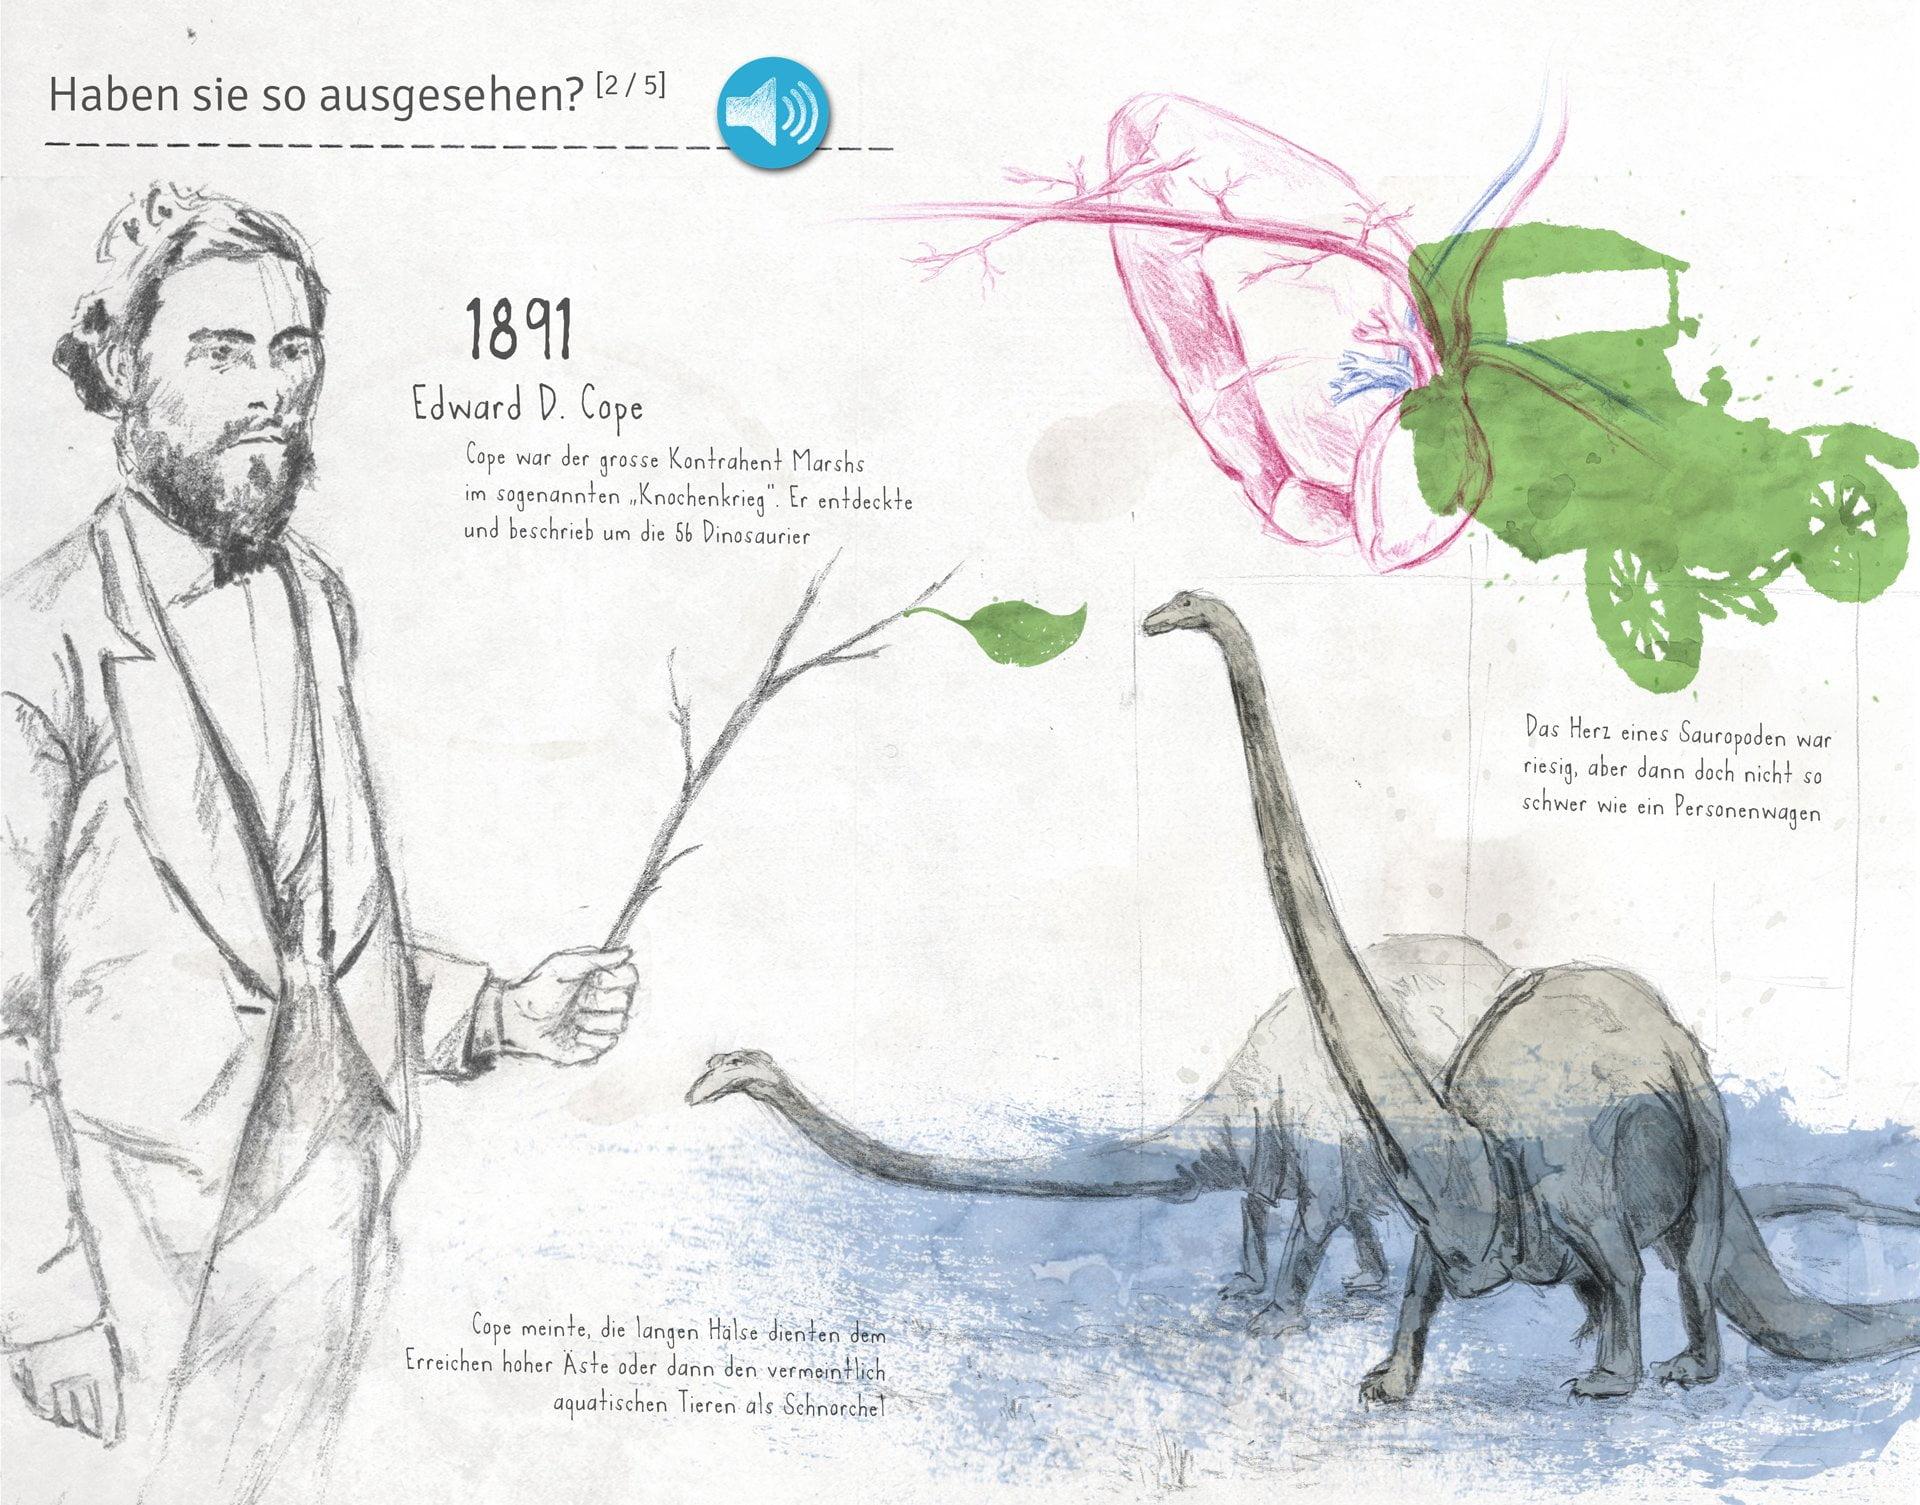 Paléoskop, digitales Skizzenbuch, Cope, ikonaut